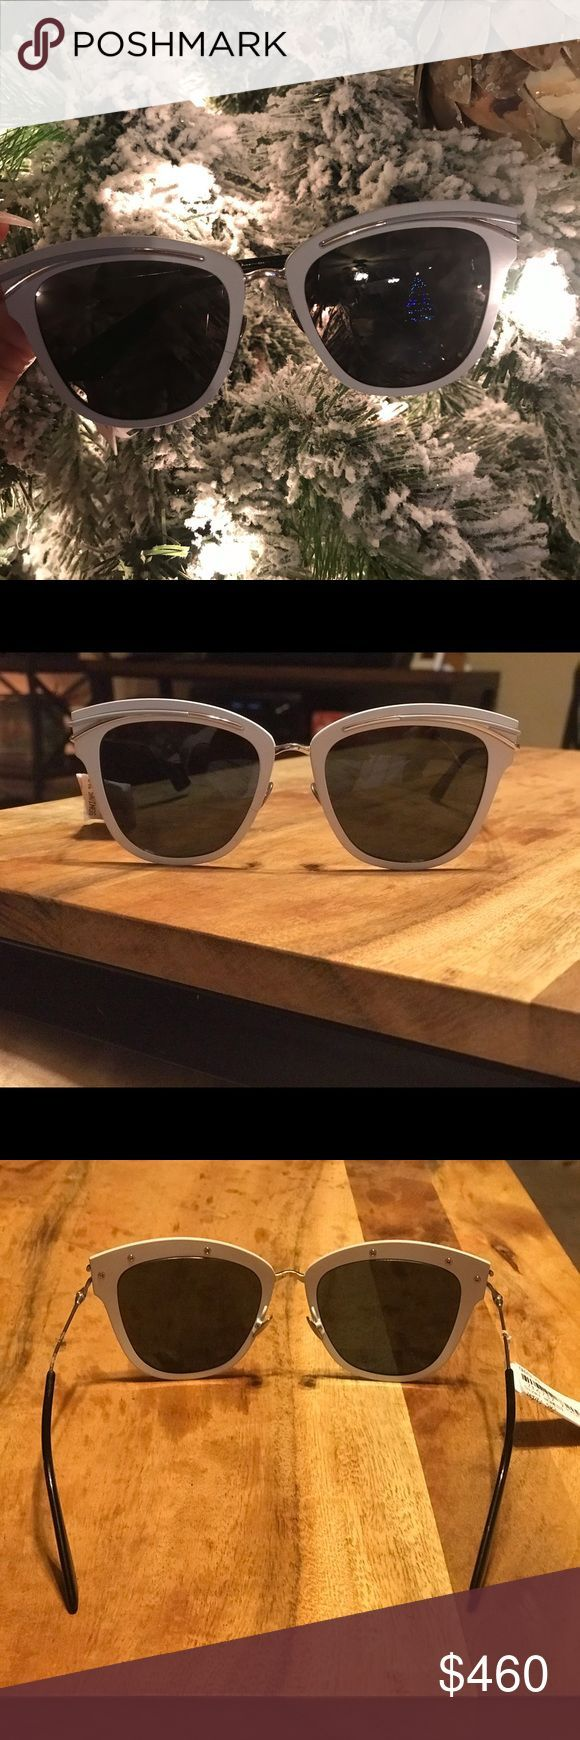 Christian Dior So Dior Cat Eye Sonnenbrille So Dior Sonnenbrille BESCHREIBUNG Mo…